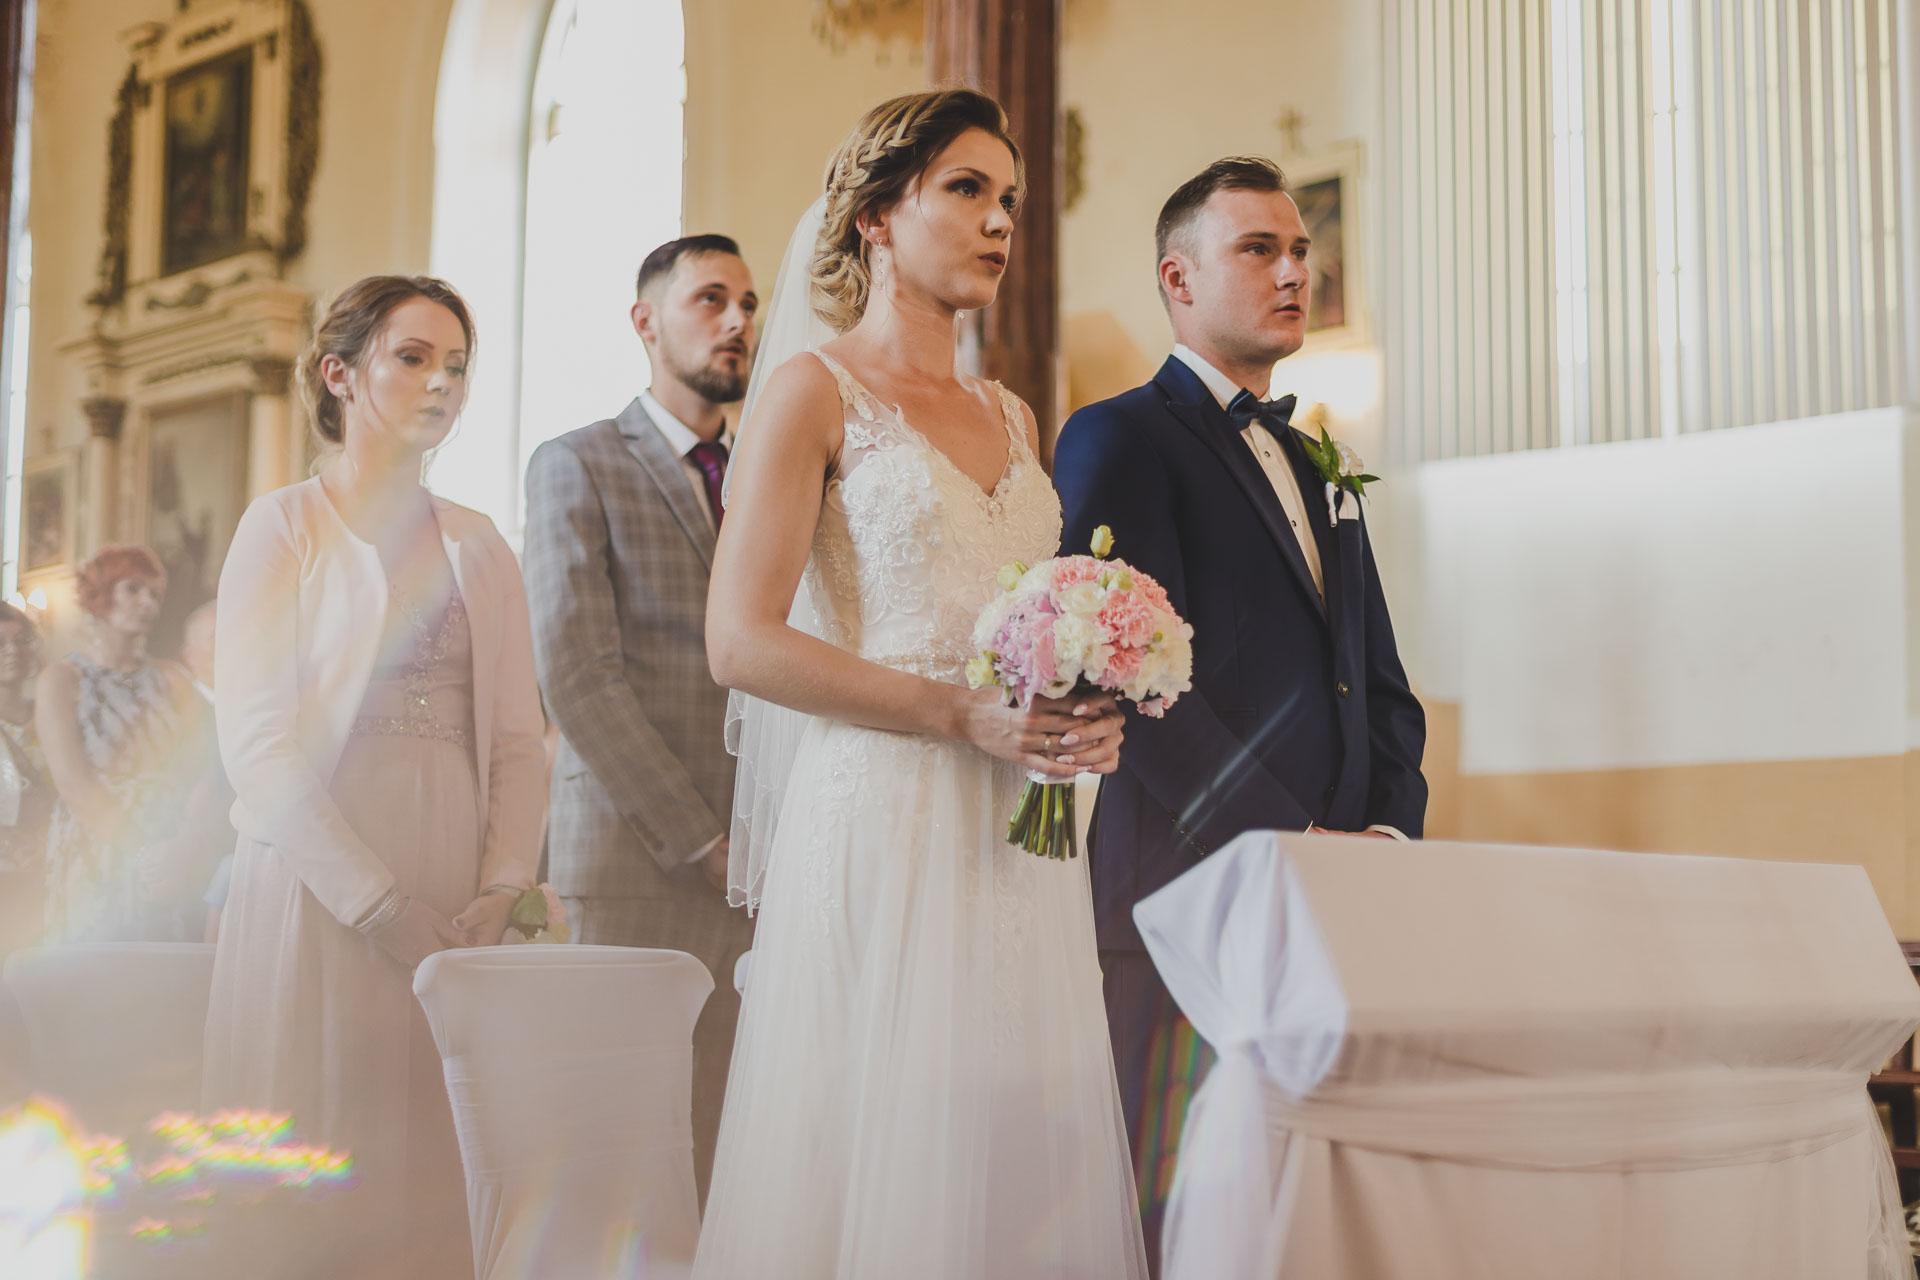 Para młoda - ceremonia ślubna